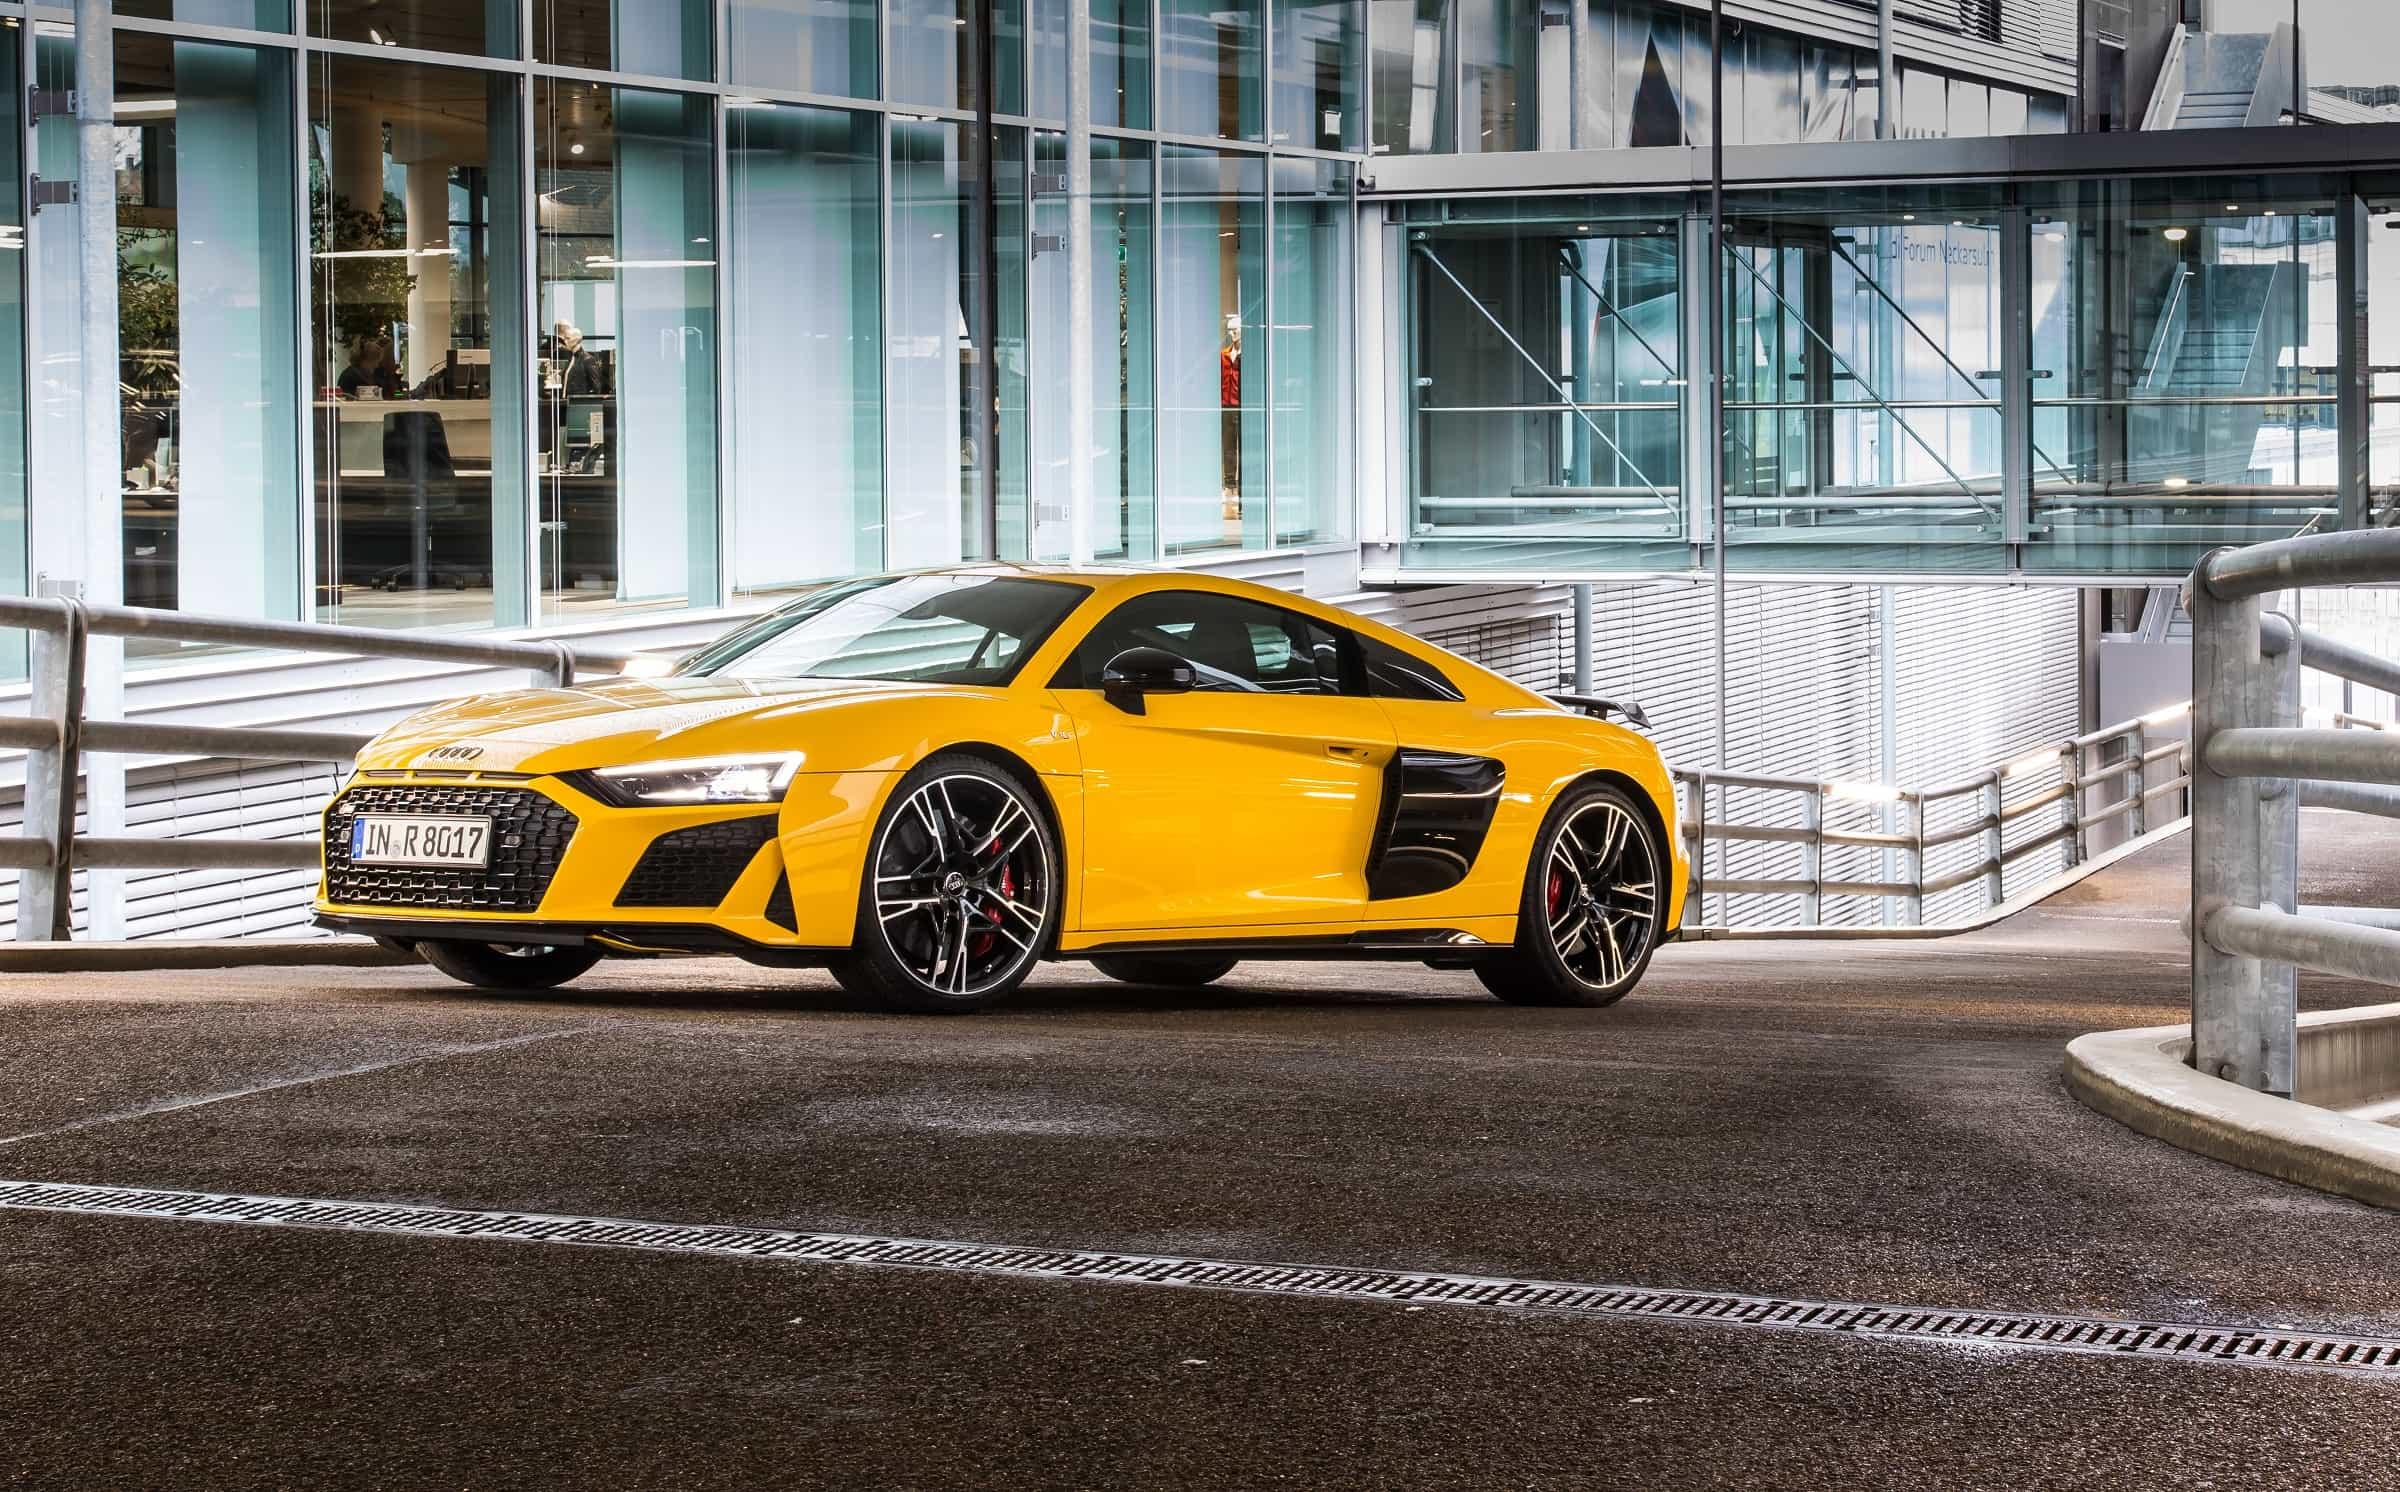 Audi RS - Η φιλοσοφία και οι λεπτομέρειες πίσω από την κατασκευή του